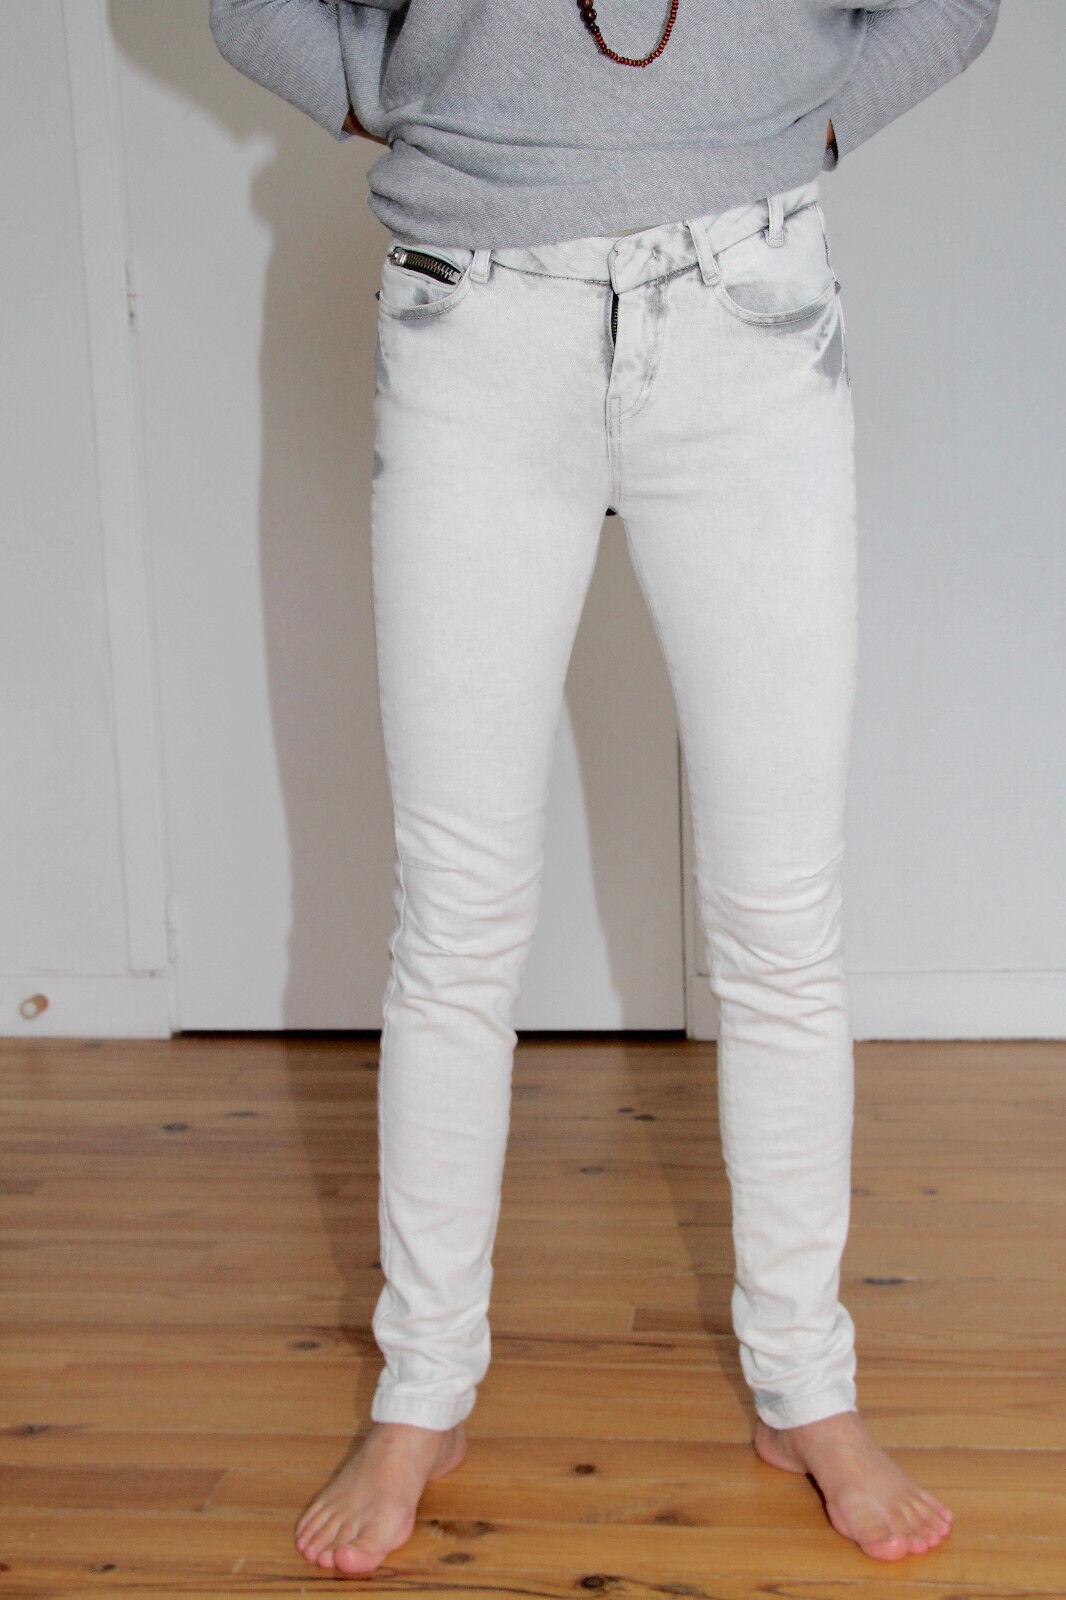 Jeans slim brume NAKED 19.04 model devil Size 26 (36) NEW LABEL v